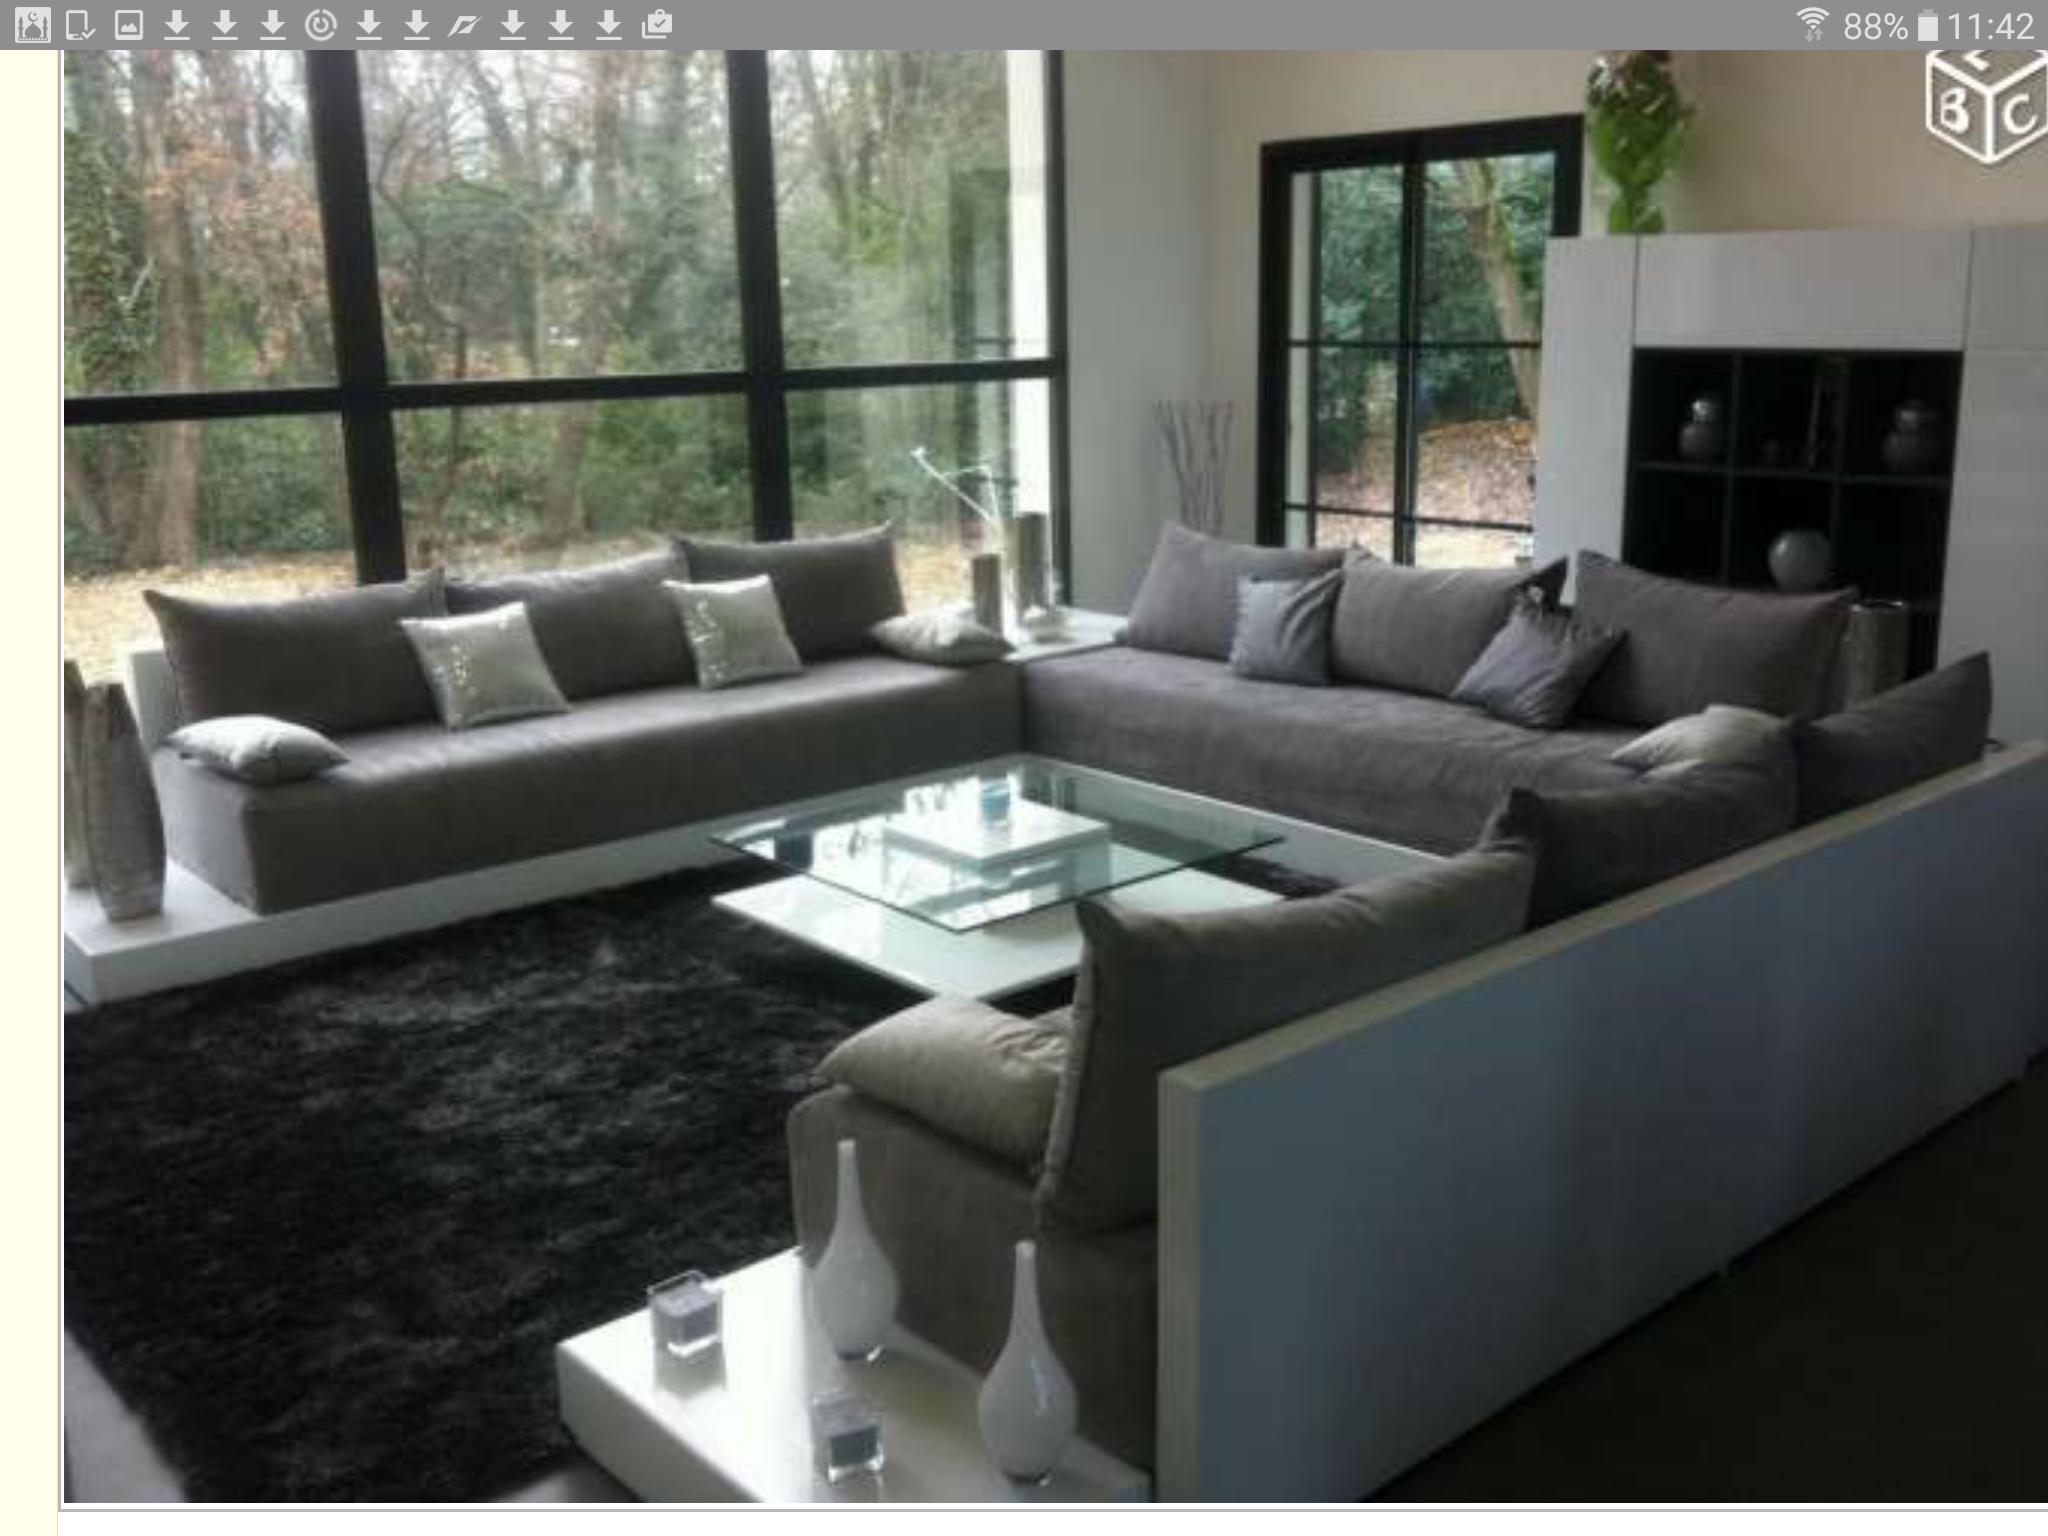 salon oriental sal en 2018 pinterest salon marocain. Black Bedroom Furniture Sets. Home Design Ideas